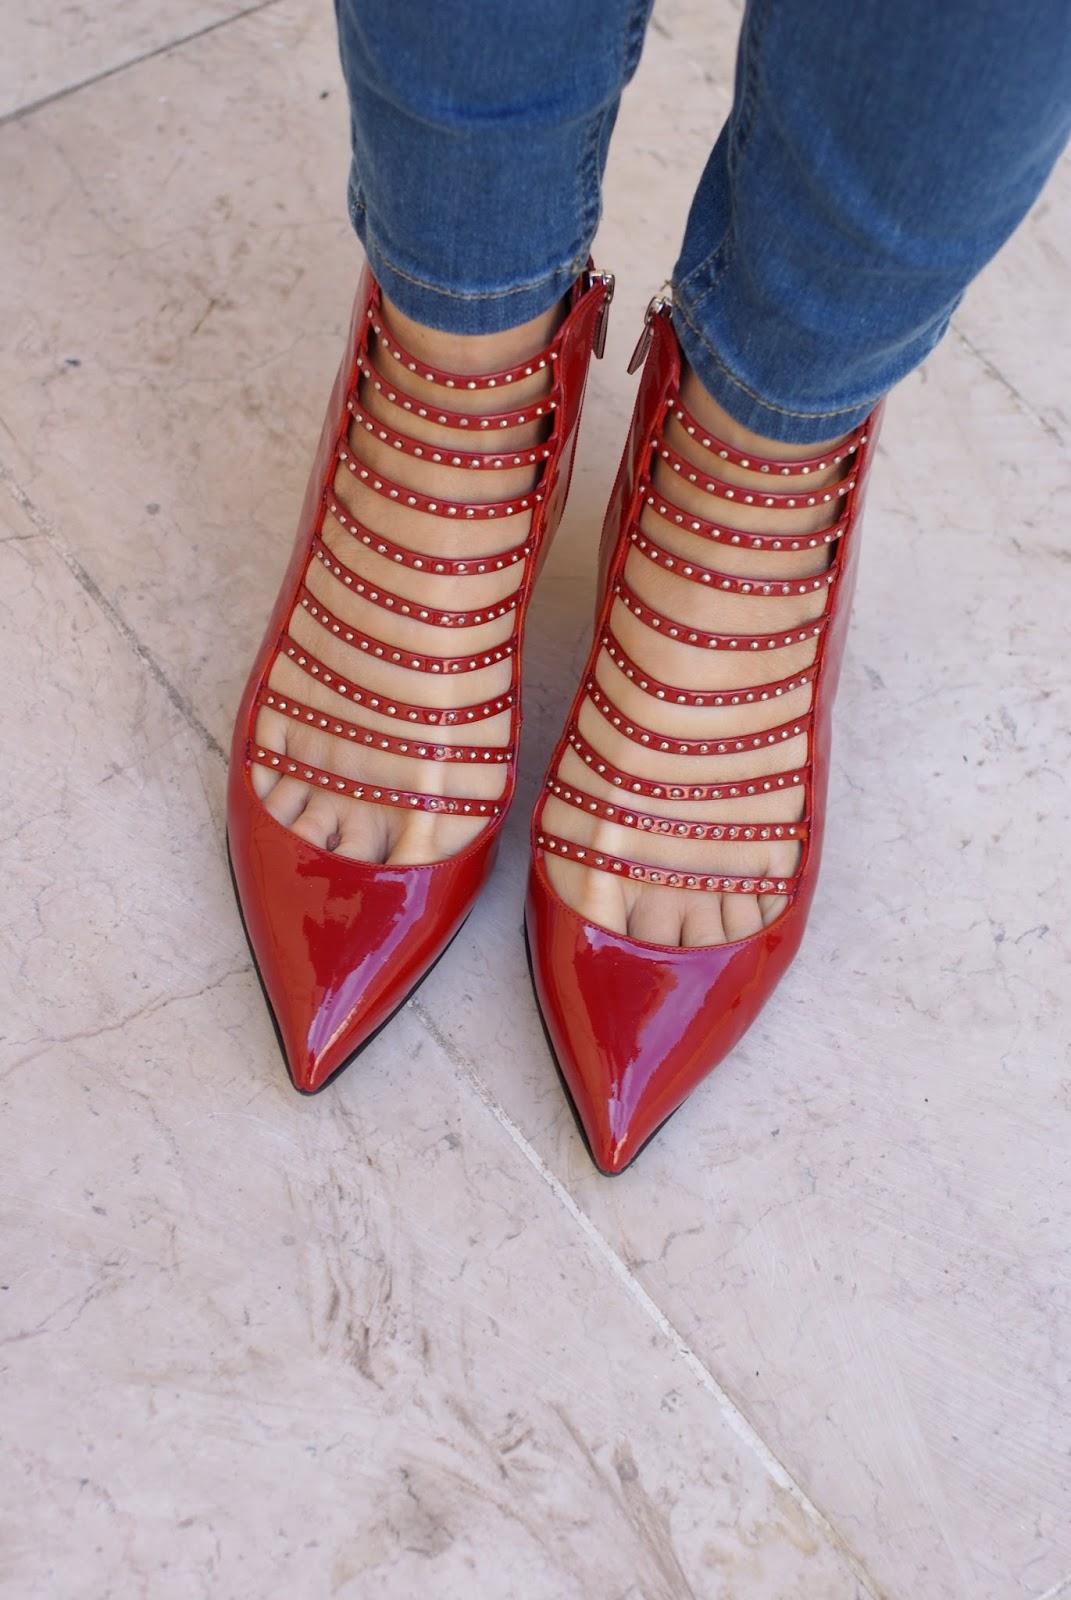 Le Silla scarpe rosse pelle vernice su Fashion and Cookies fashion blog, italian fashion blogger